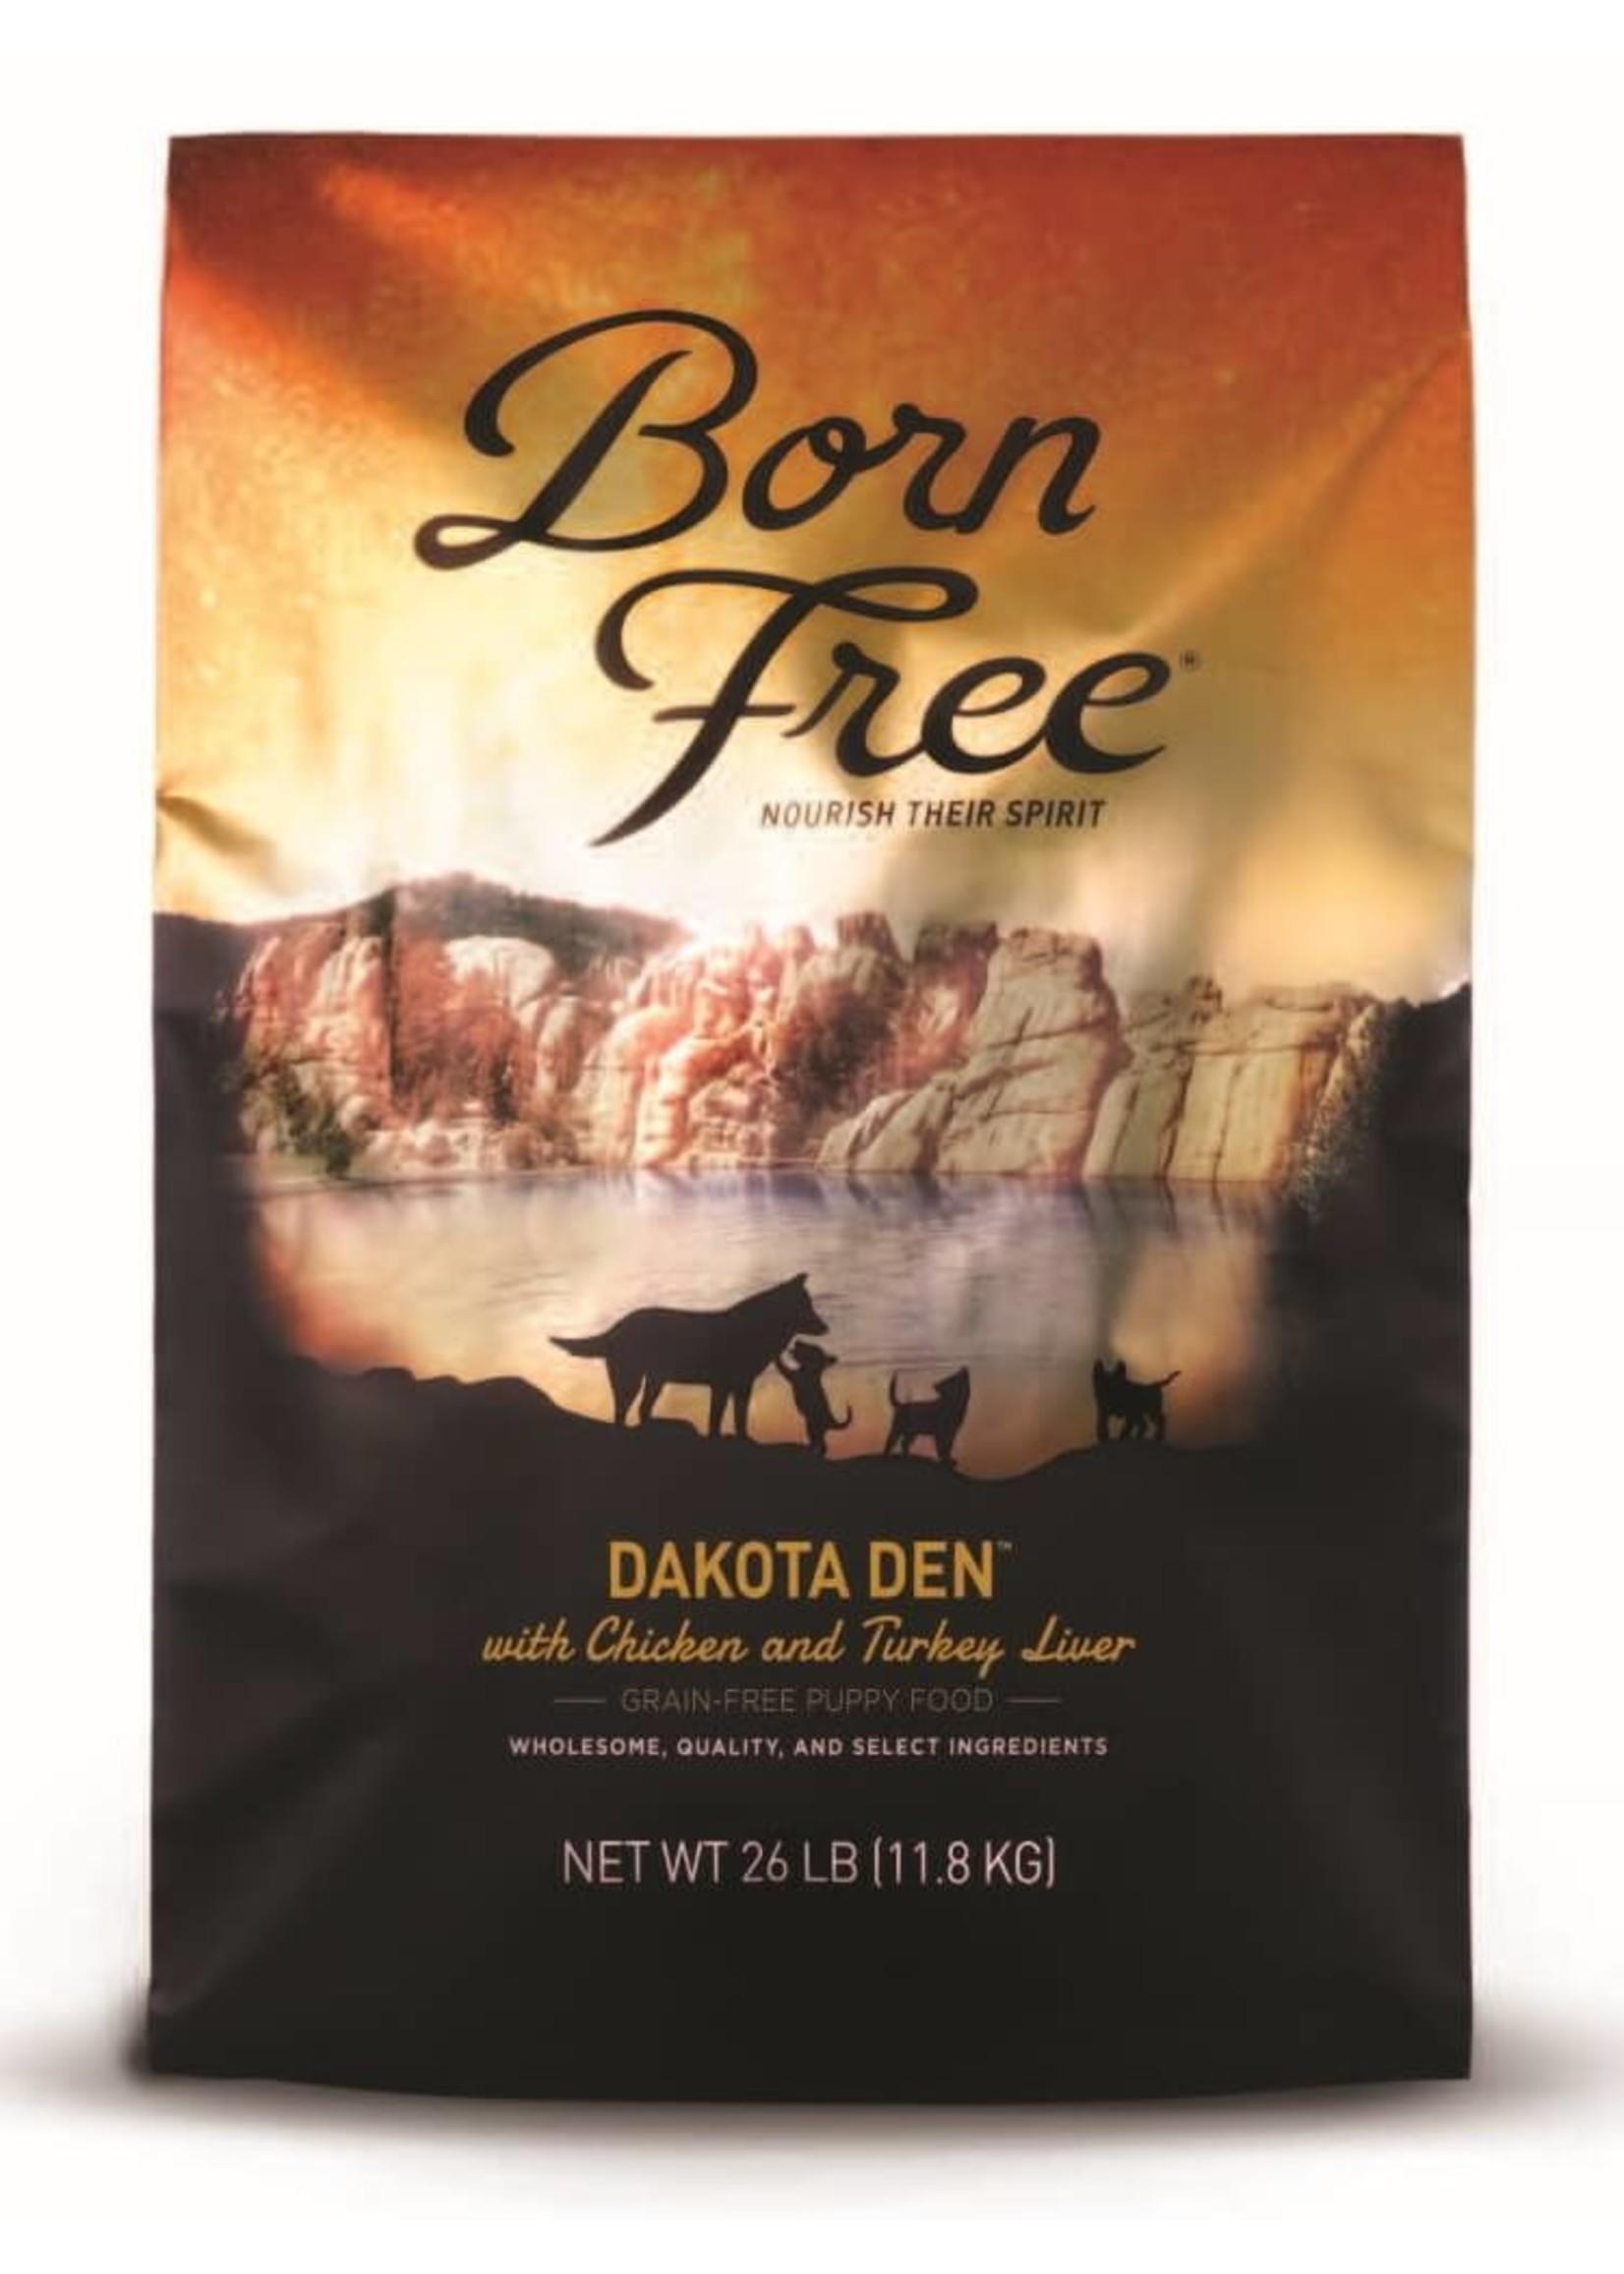 Born Free Born Free Puppy Food Dakota Den, 26lb Bag